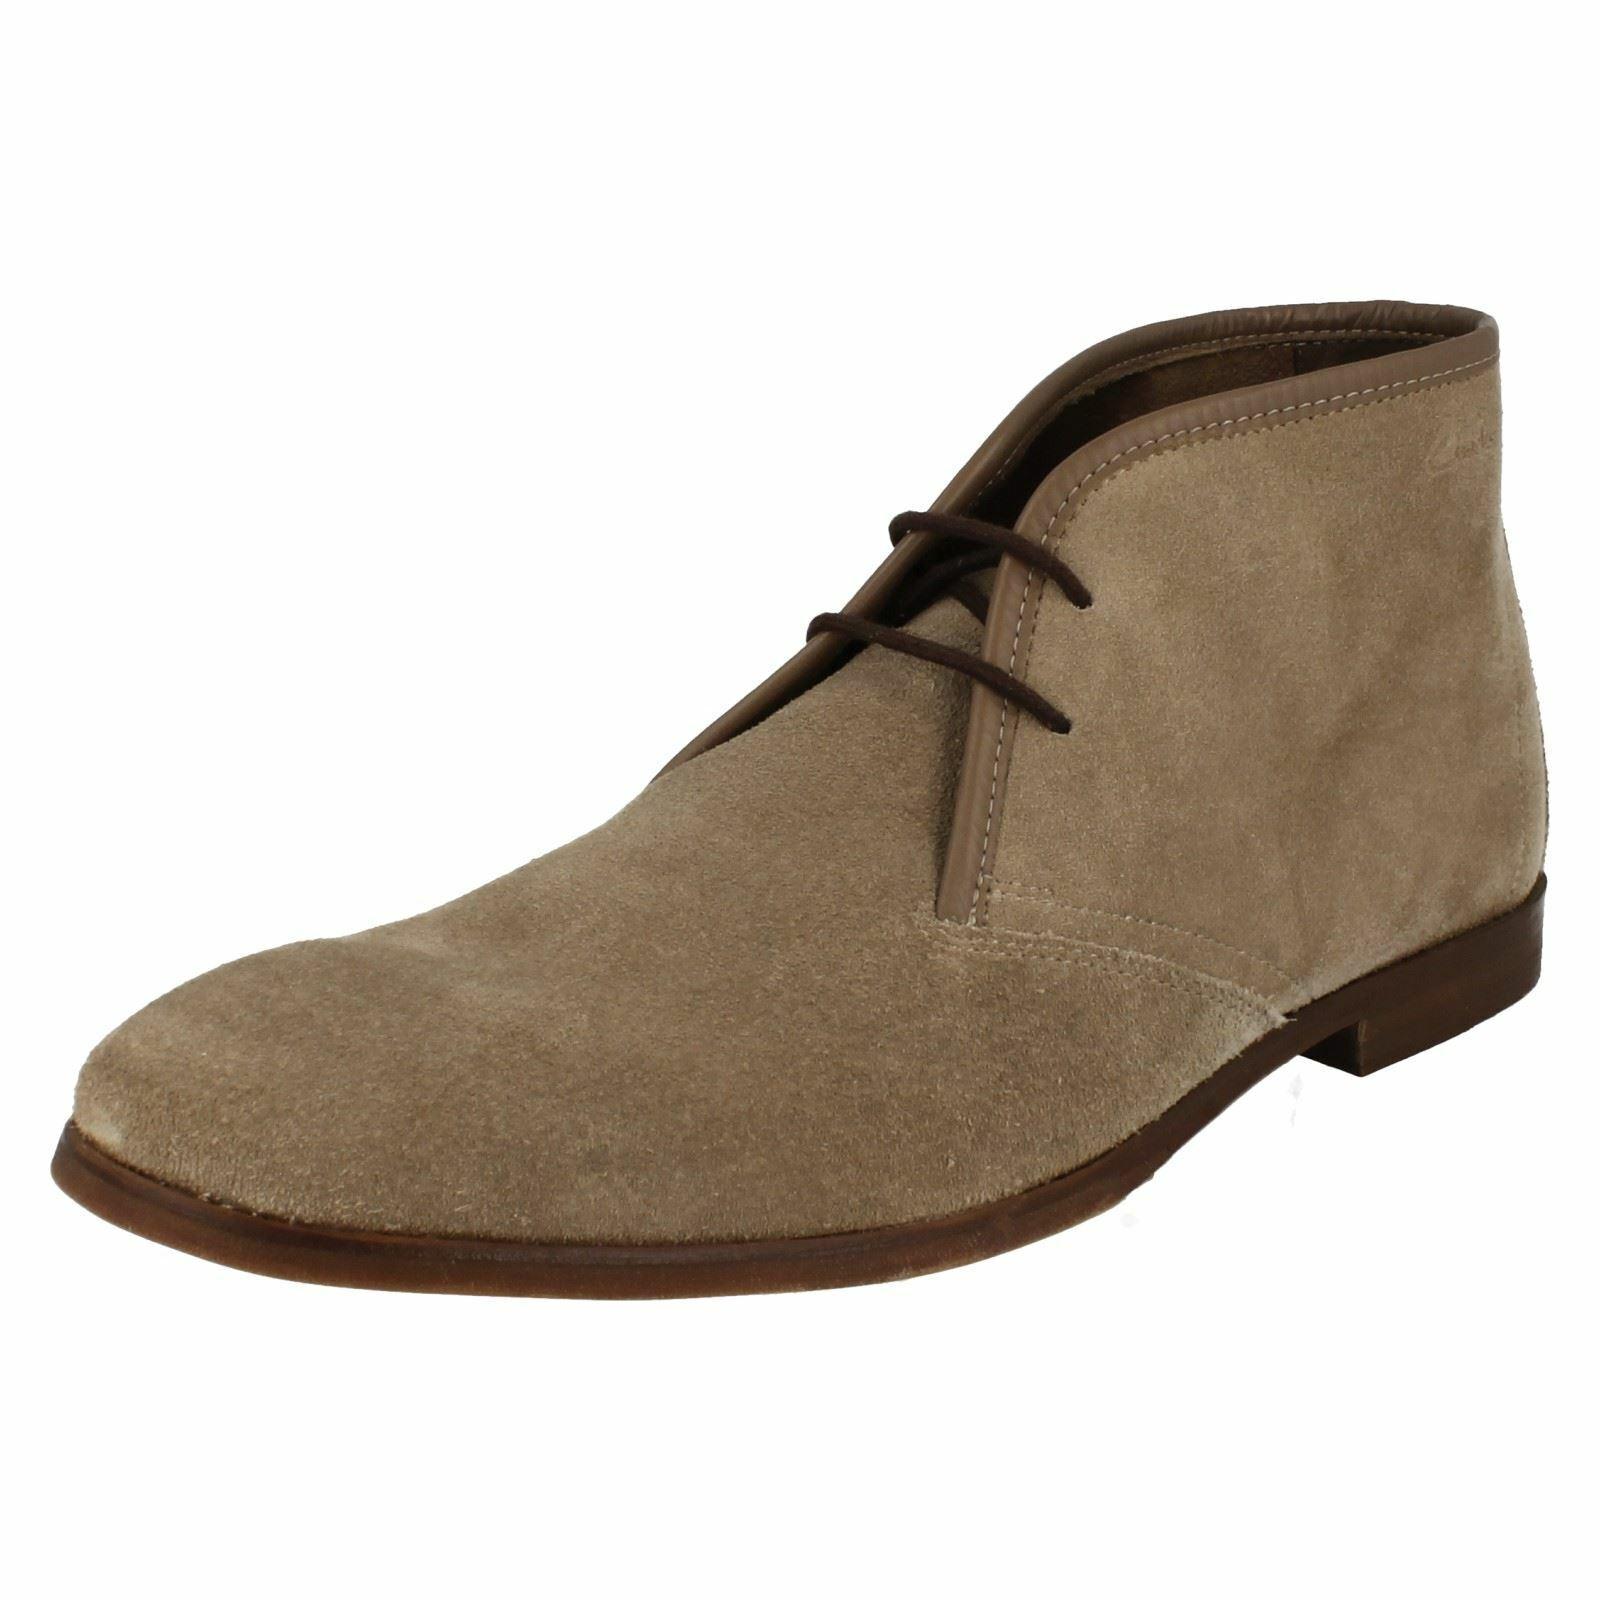 Clarks Informal botas al tobillo para Hombre 'Euston hacia arriba